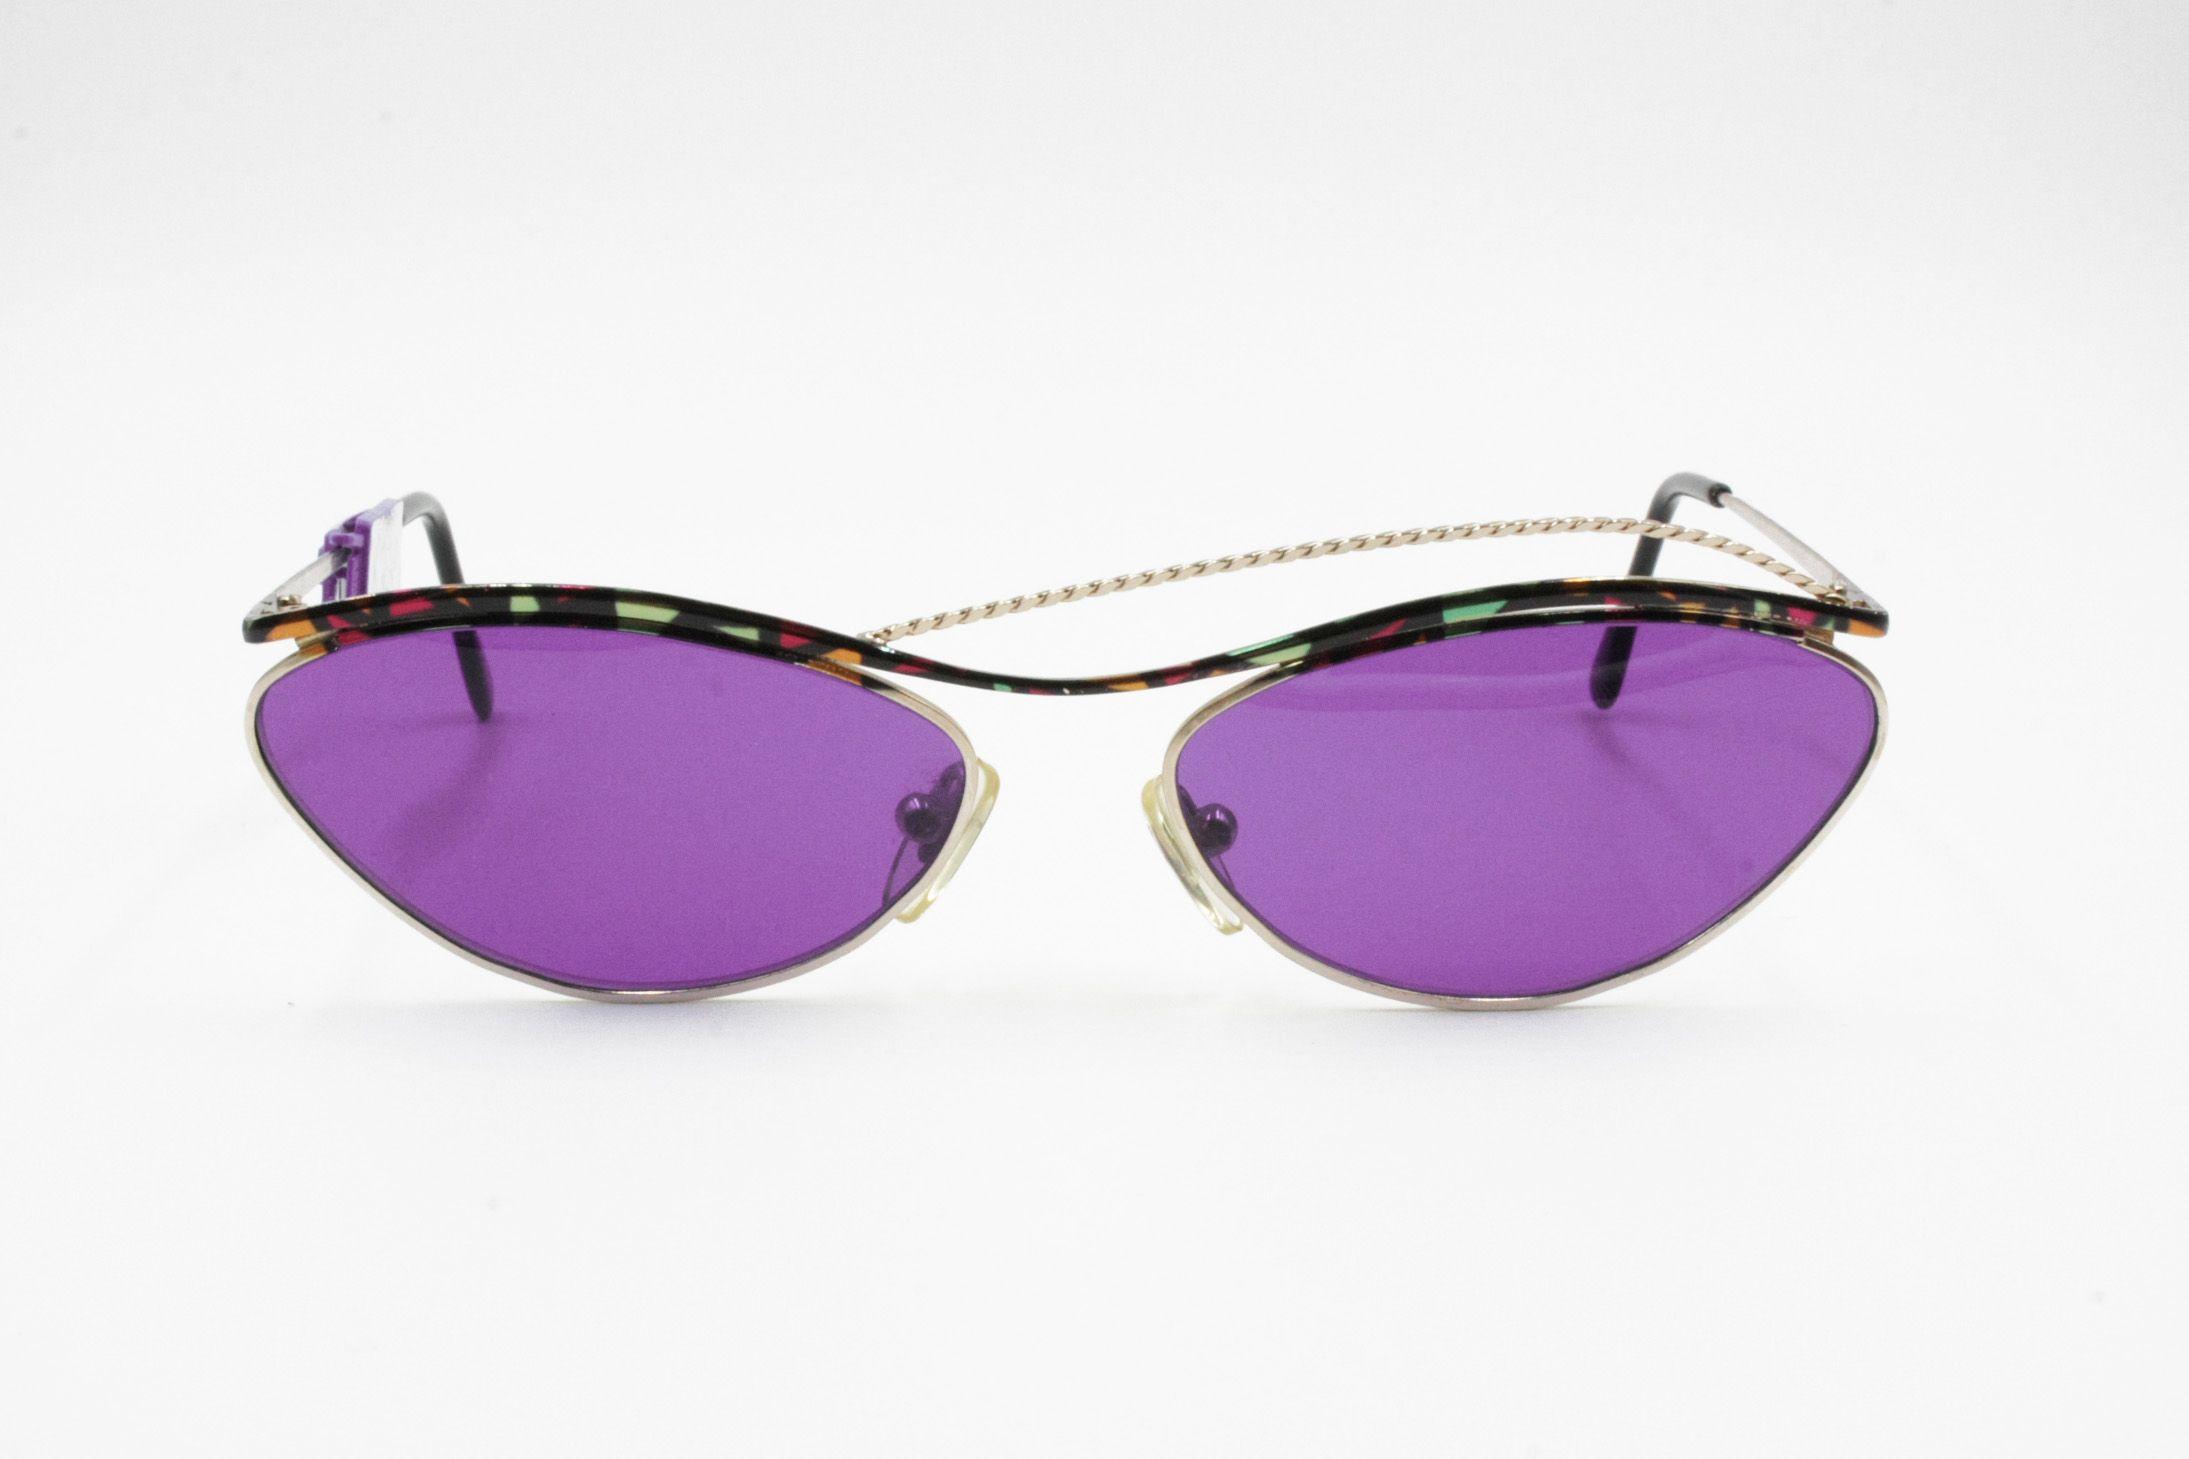 4c2863ad2bf4b ALANTI 249 - 13 Rare designer sunglasses VTG 70s